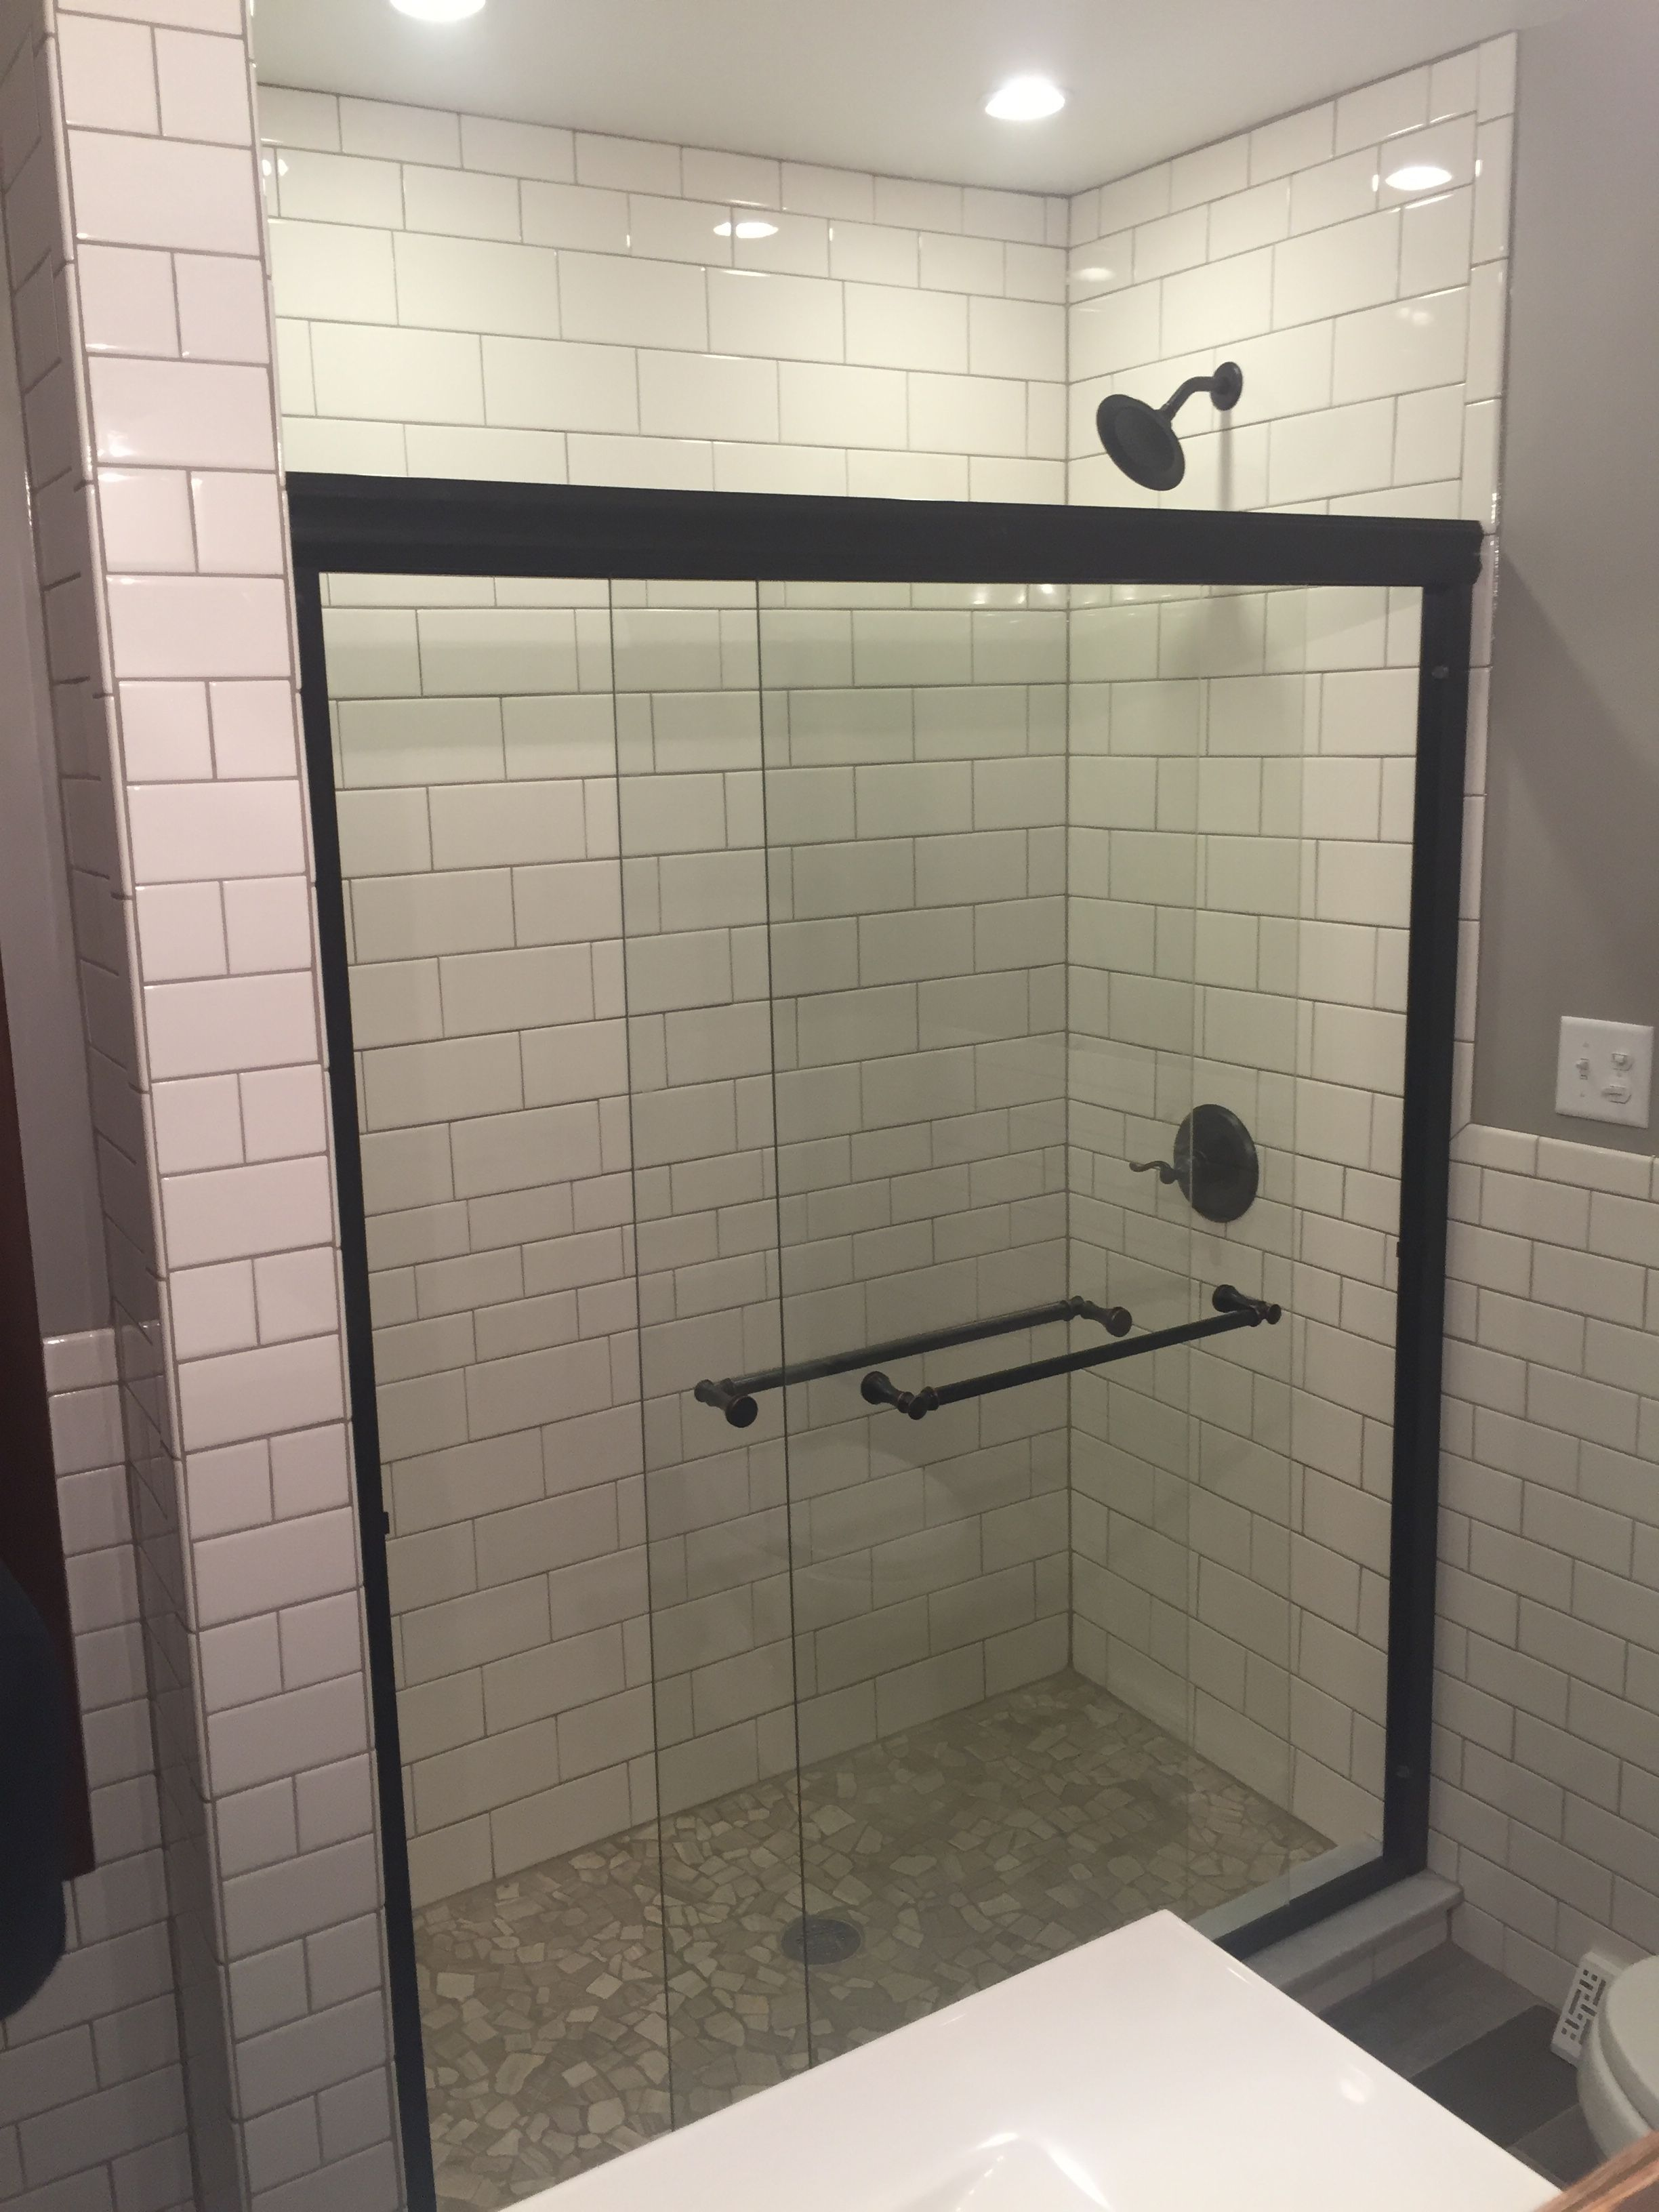 Reclaimed subway tile choice image tile flooring design ideas remodel modern rustic bathroom with white subway tile and remodel modern rustic bathroom with white subway dailygadgetfo Images